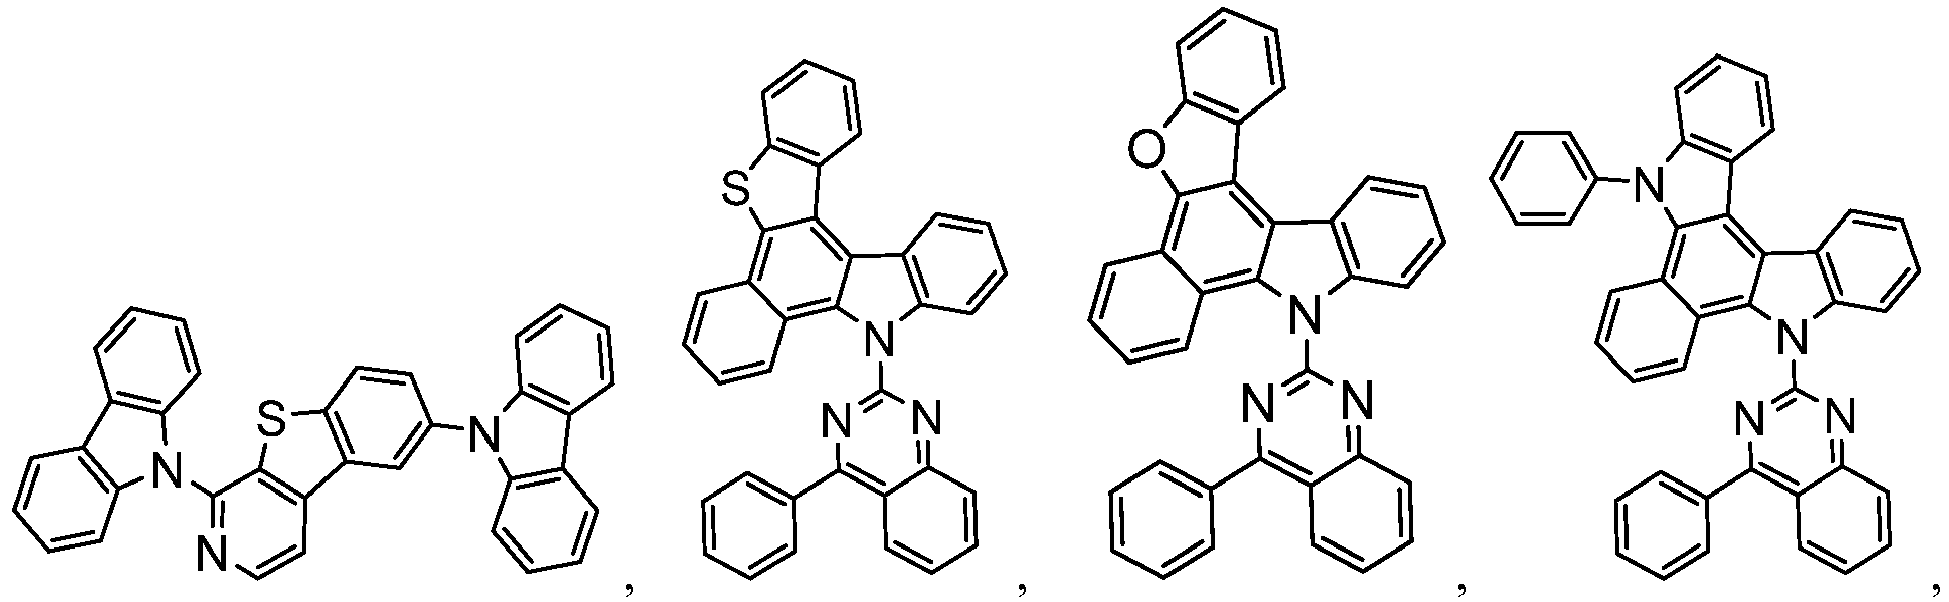 Figure imgb0901